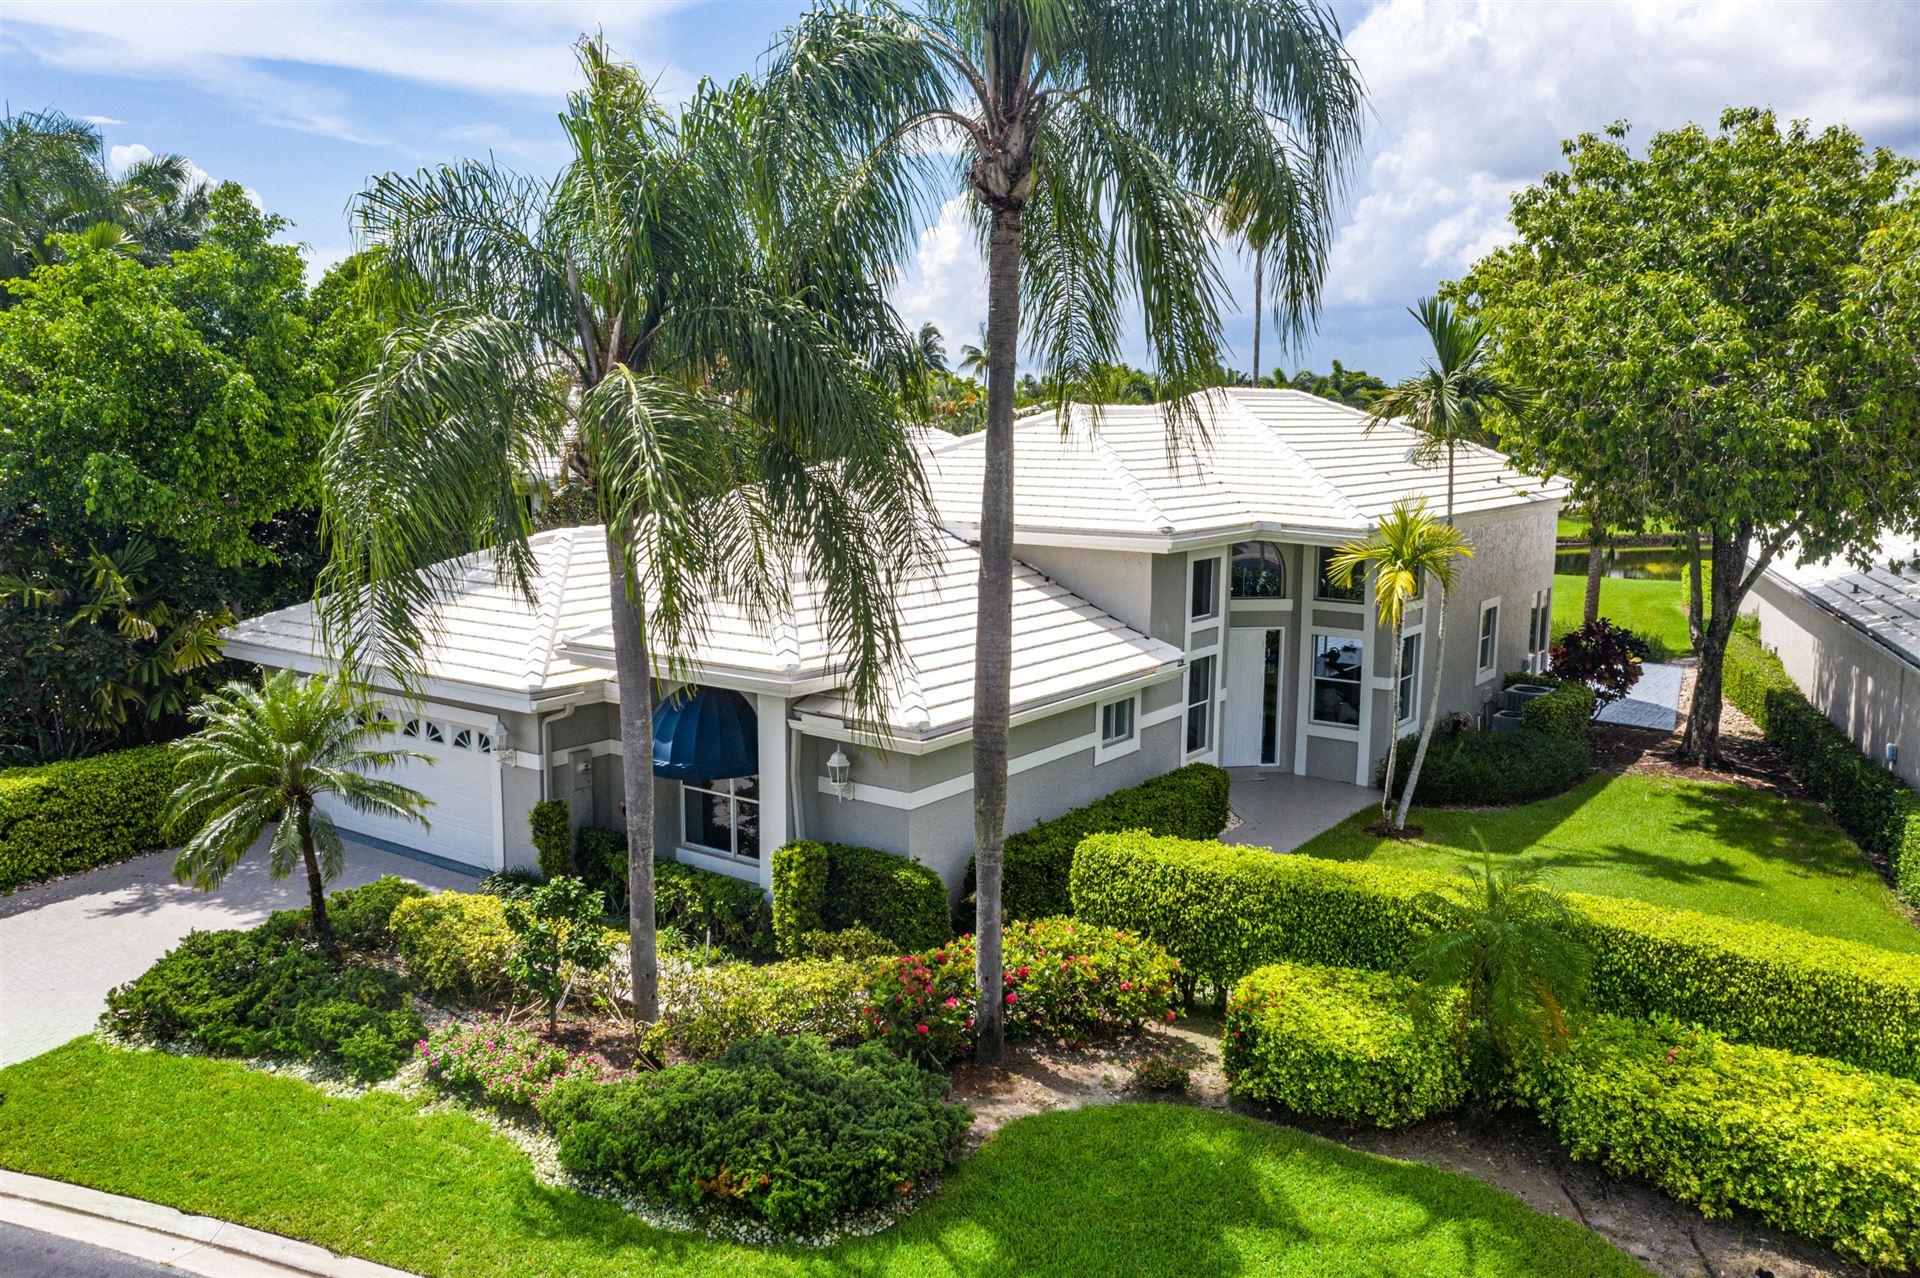 5697 Huntington Park Court, Boca Raton, FL 33496 - #: RX-10624901